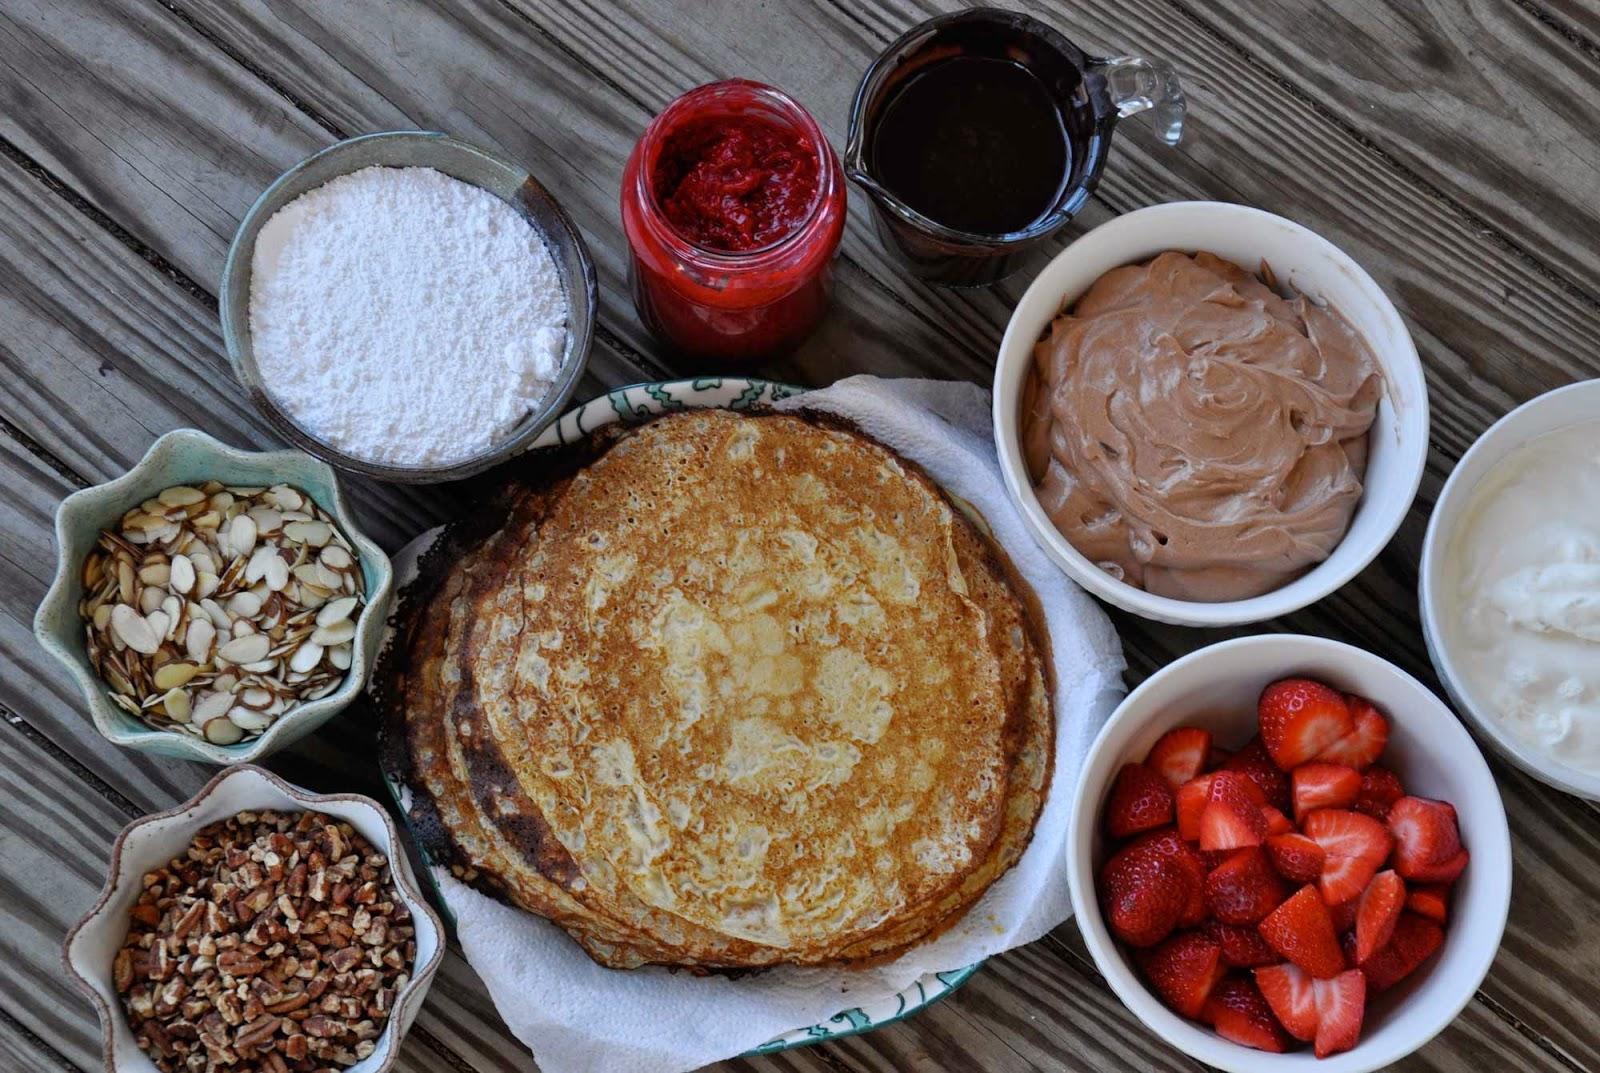 pepite_crepe_bar_food